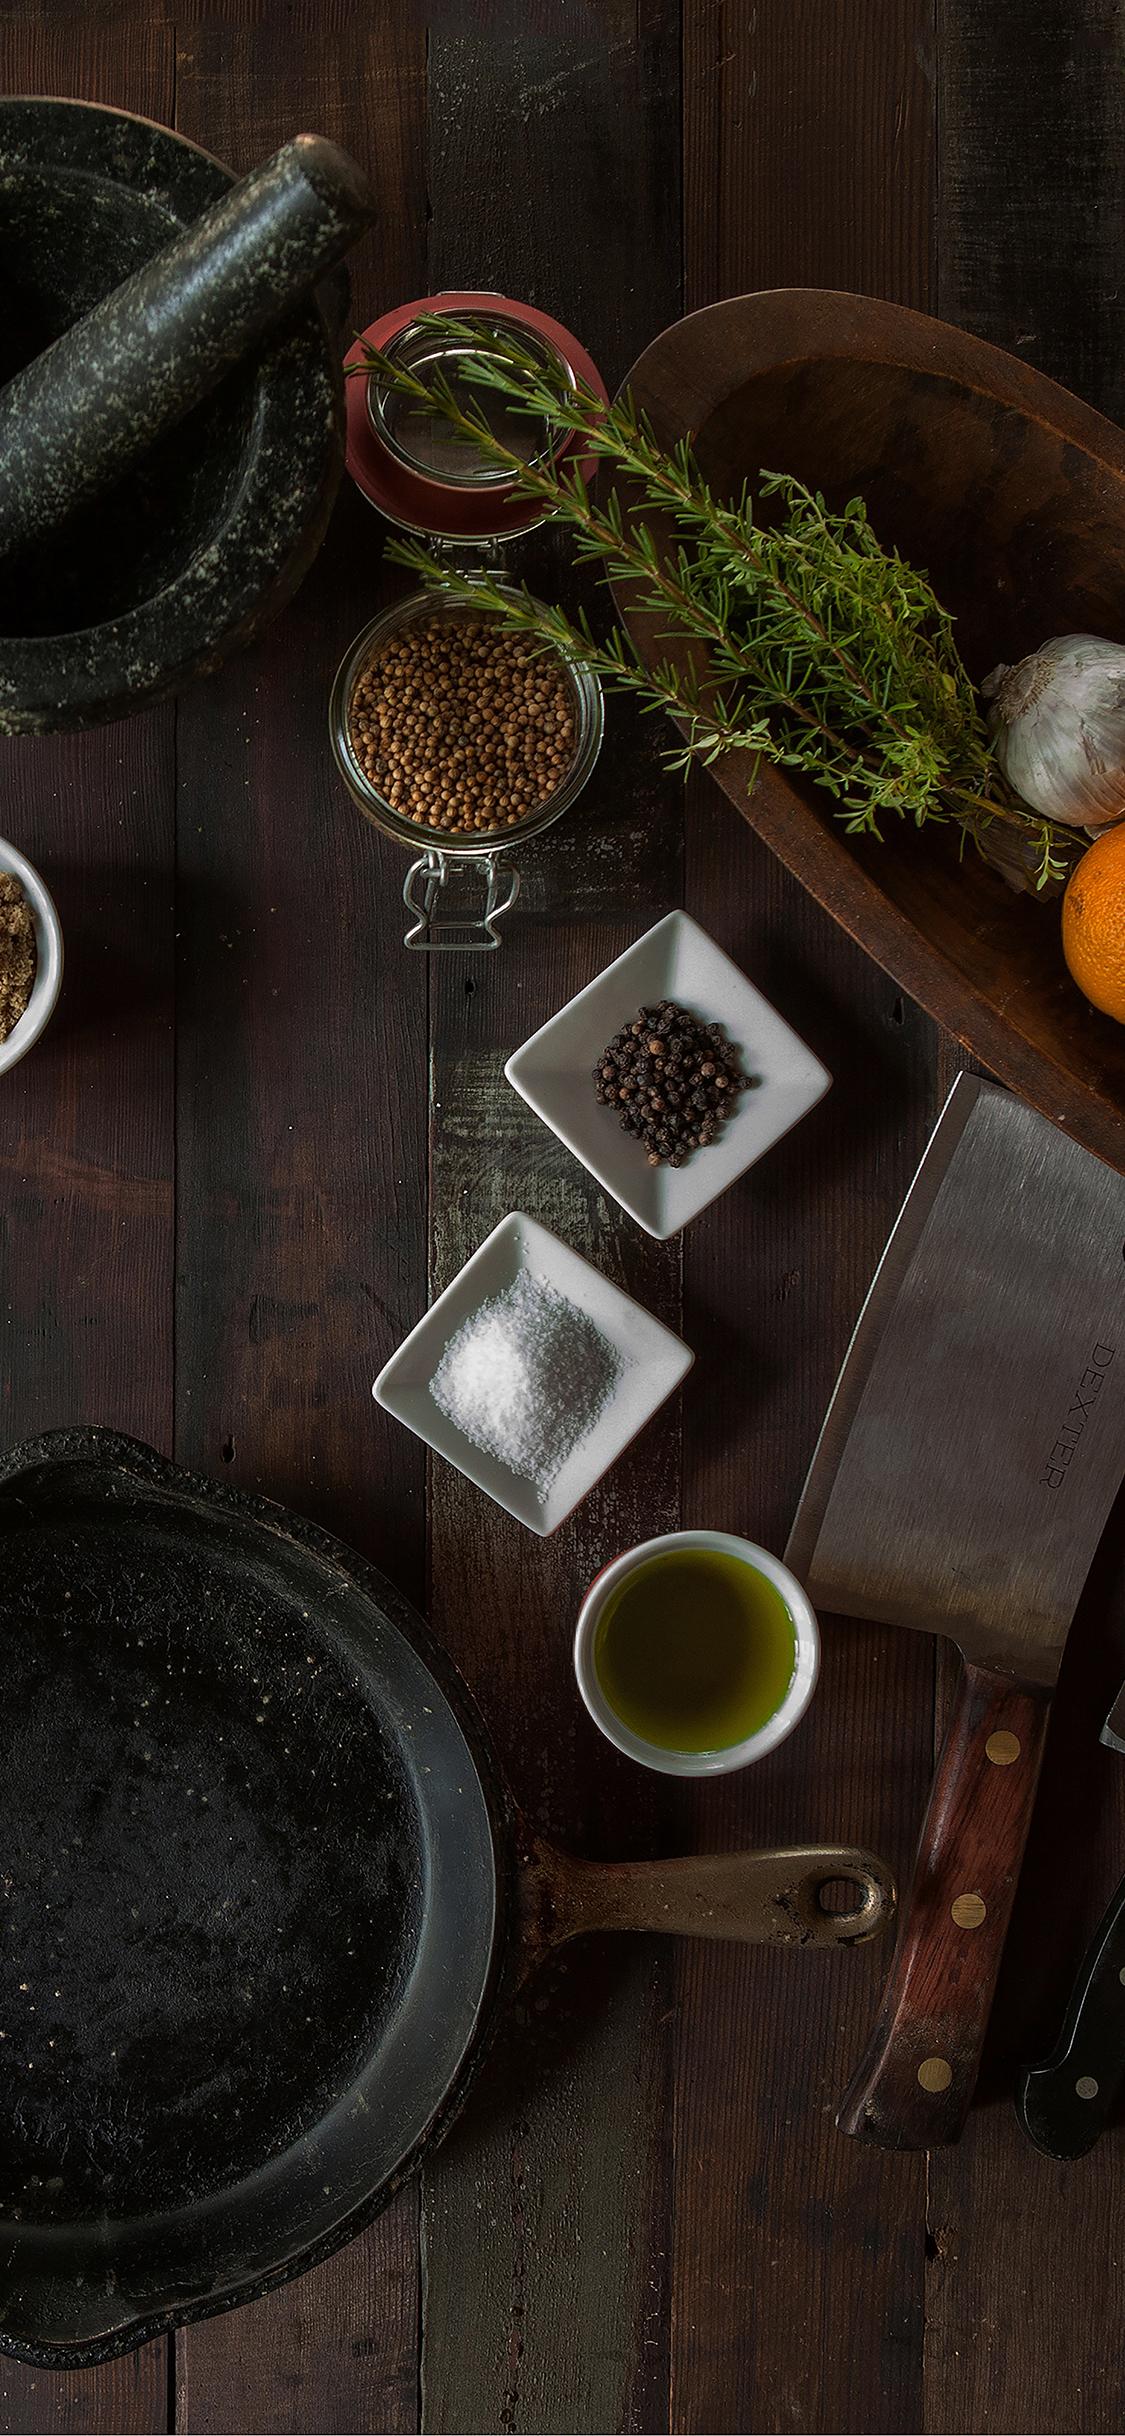 iPhoneXpapers.com-Apple-iPhone-wallpaper-mi52-breakfast-dish-todd-quackenbush-photo-nature